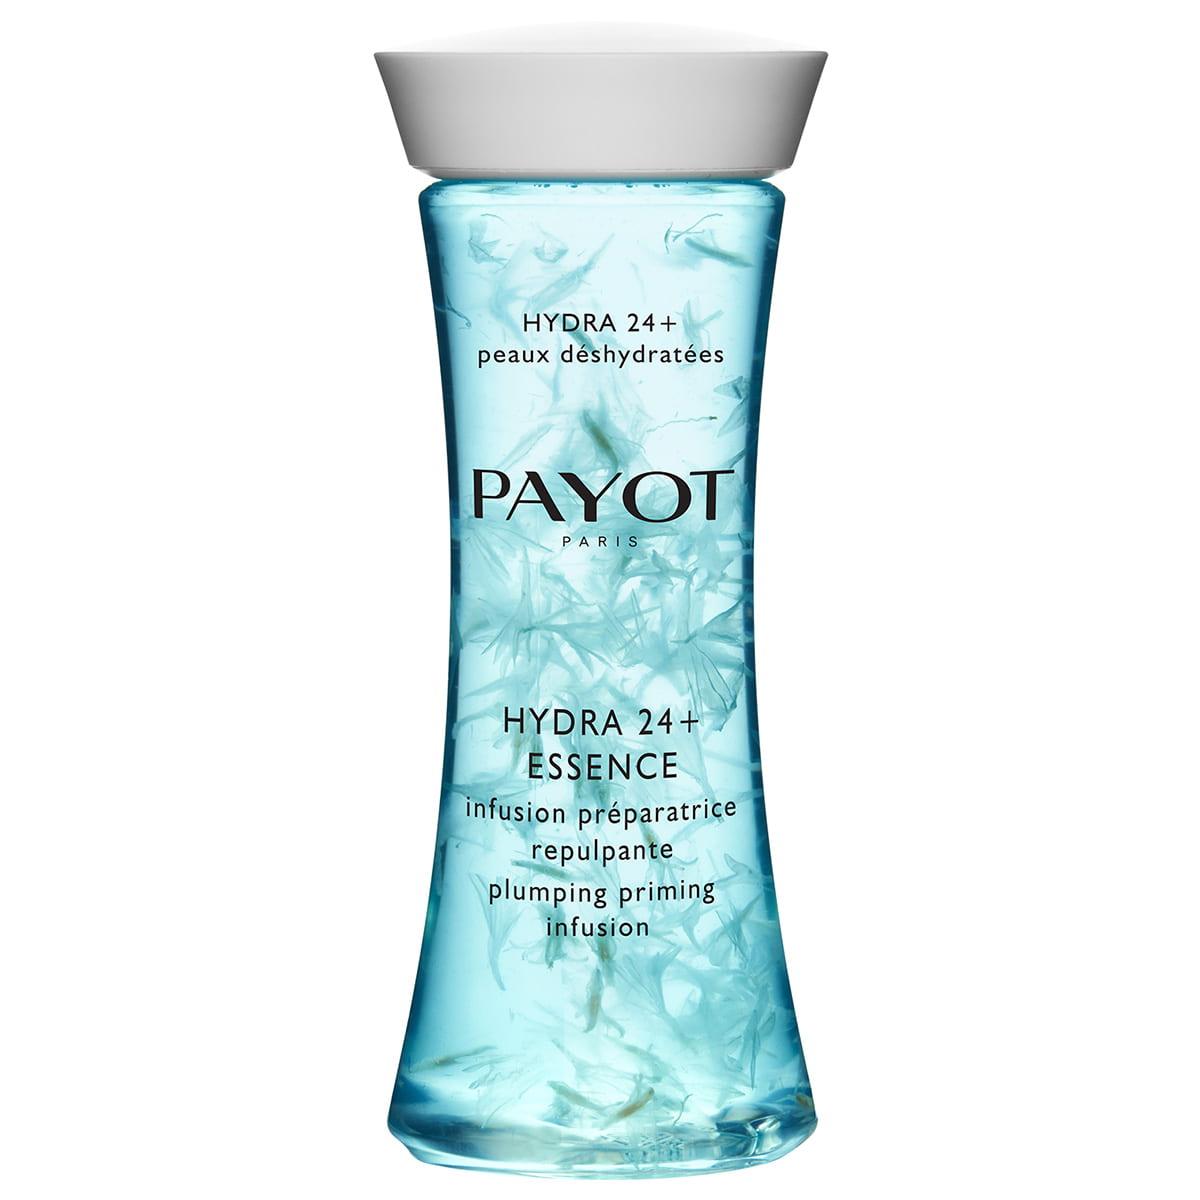 Payot - Hydra 24 + Essence